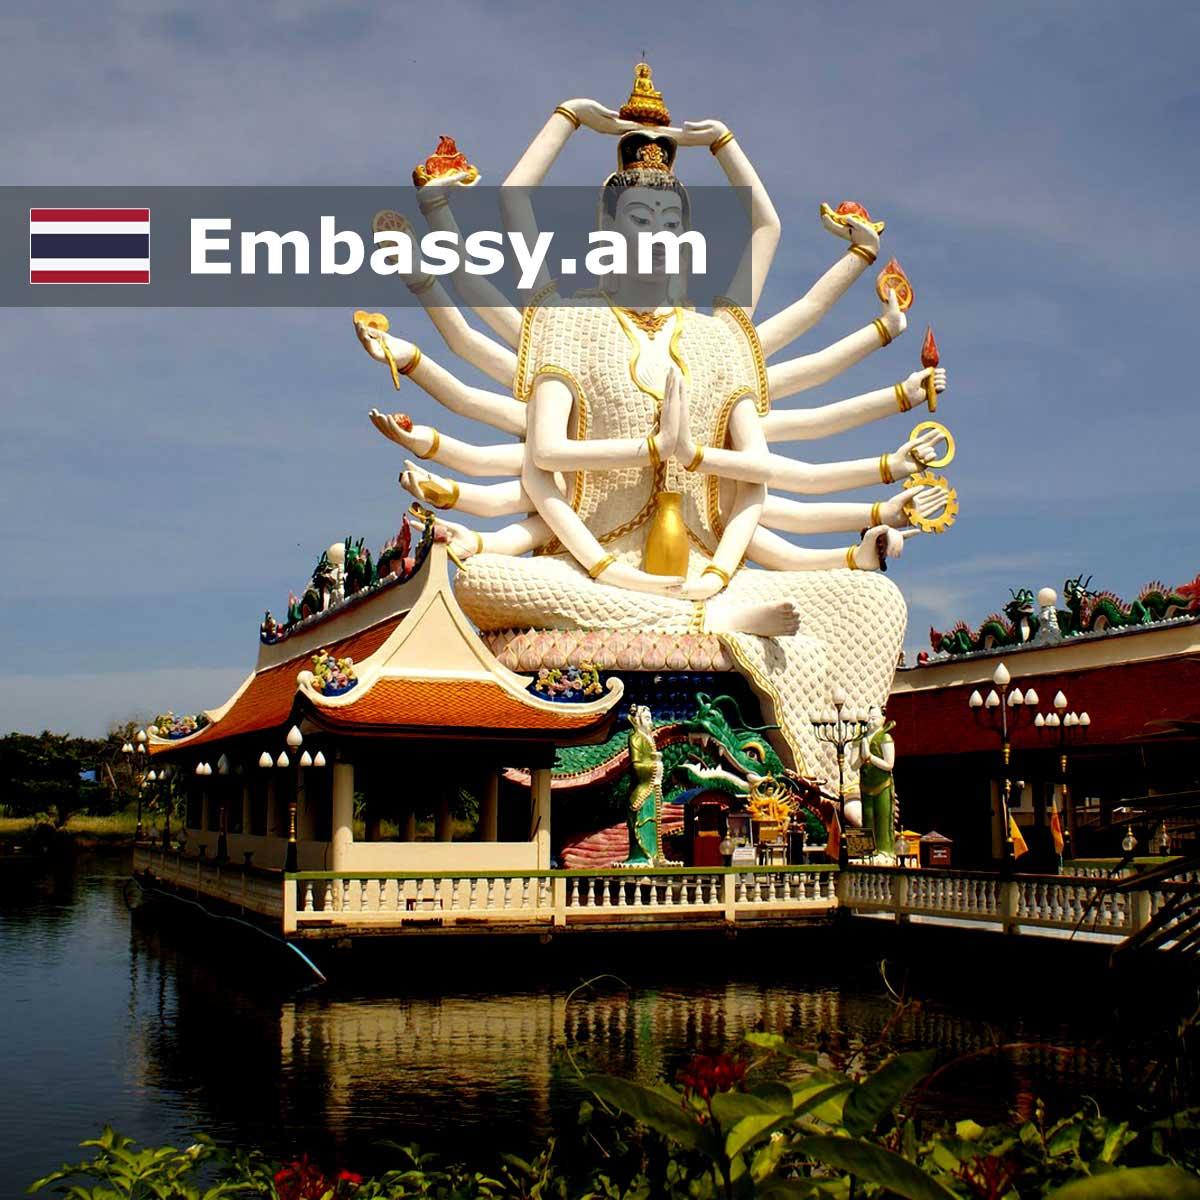 Самуй - Отели в Таиланде - Embassy.am